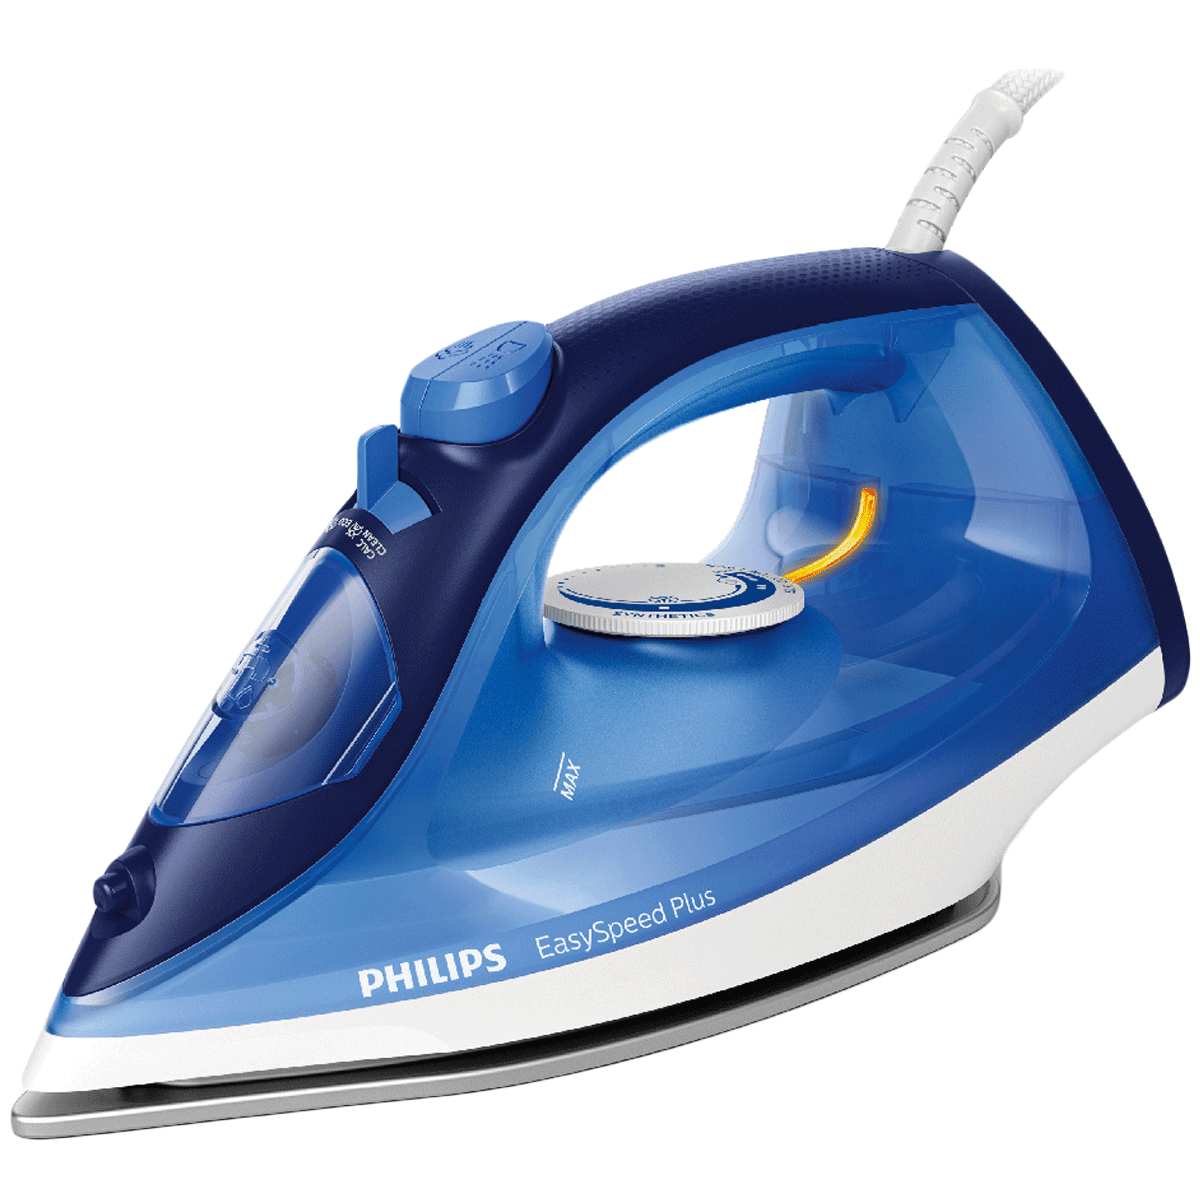 Philips EasySpeed Plus 2200 Watts 270ml Steam Iron (Durable Ceramic Soleplate, GC2145/20, Blue)